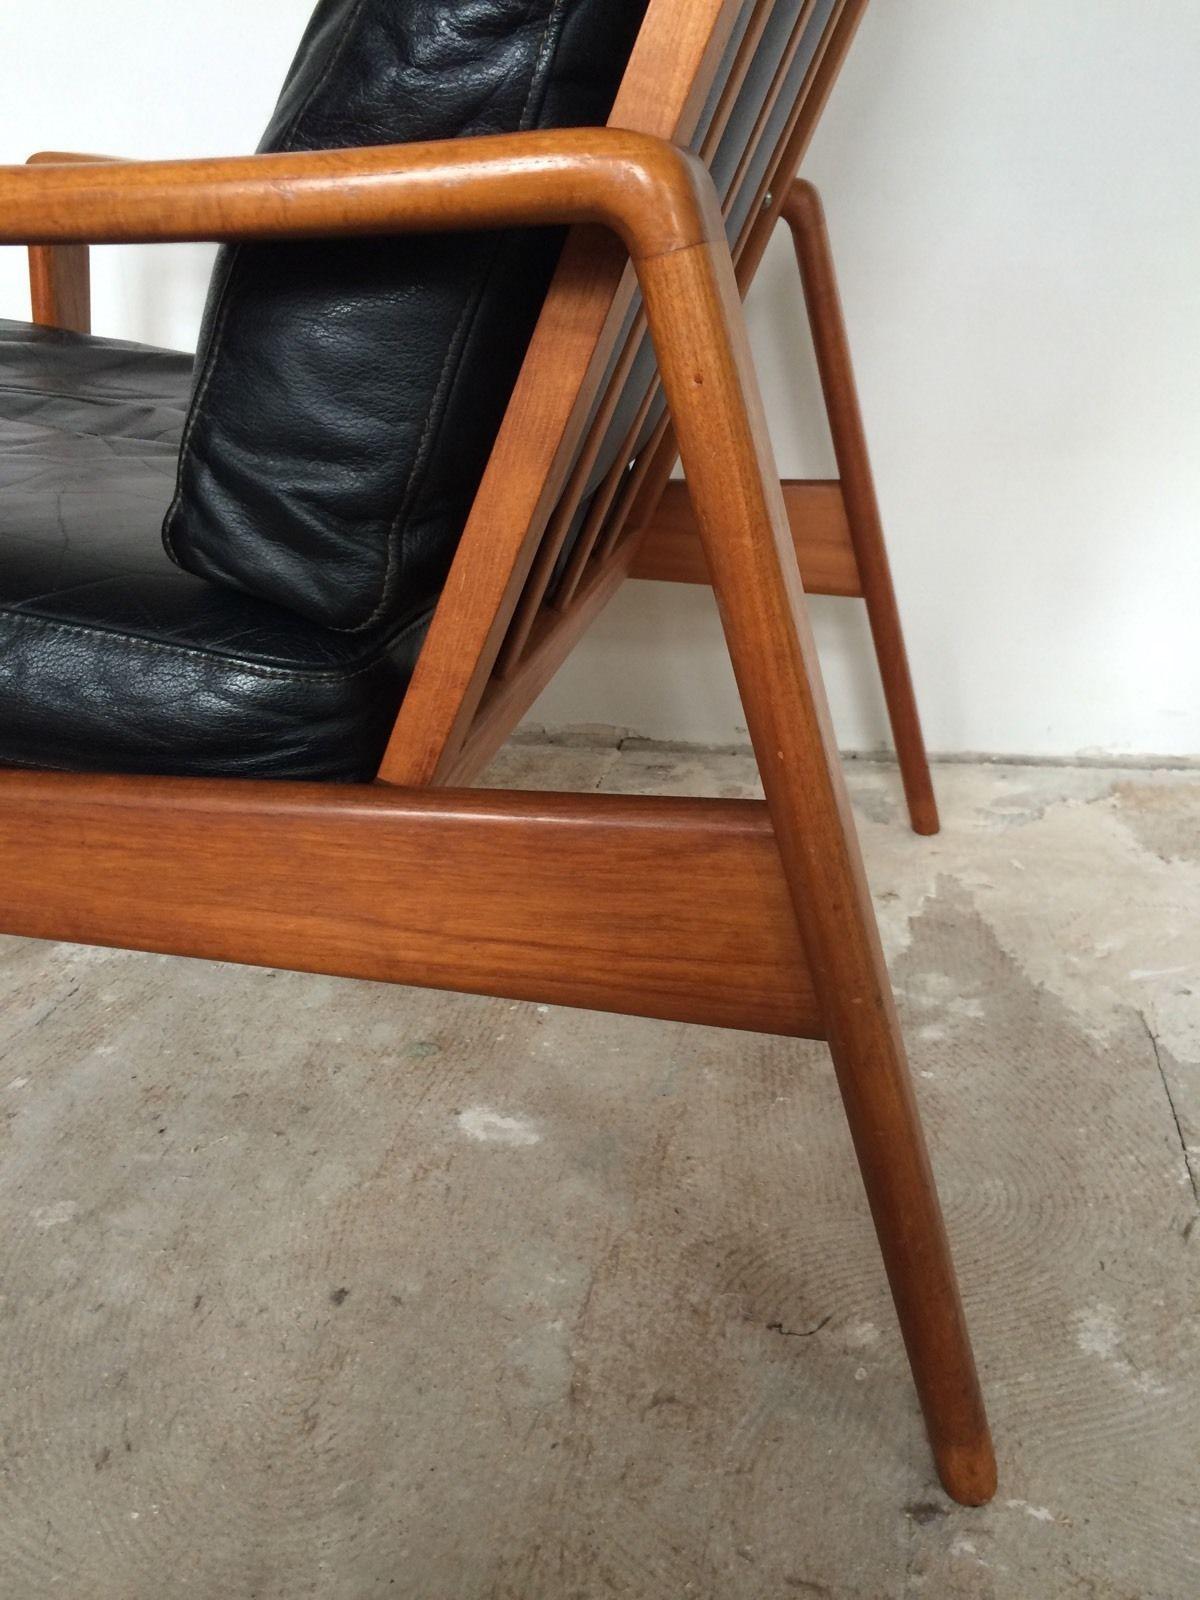 Arne Wahl Iversen Komfort Lounge Chair Teak 60s Danish Design Leder